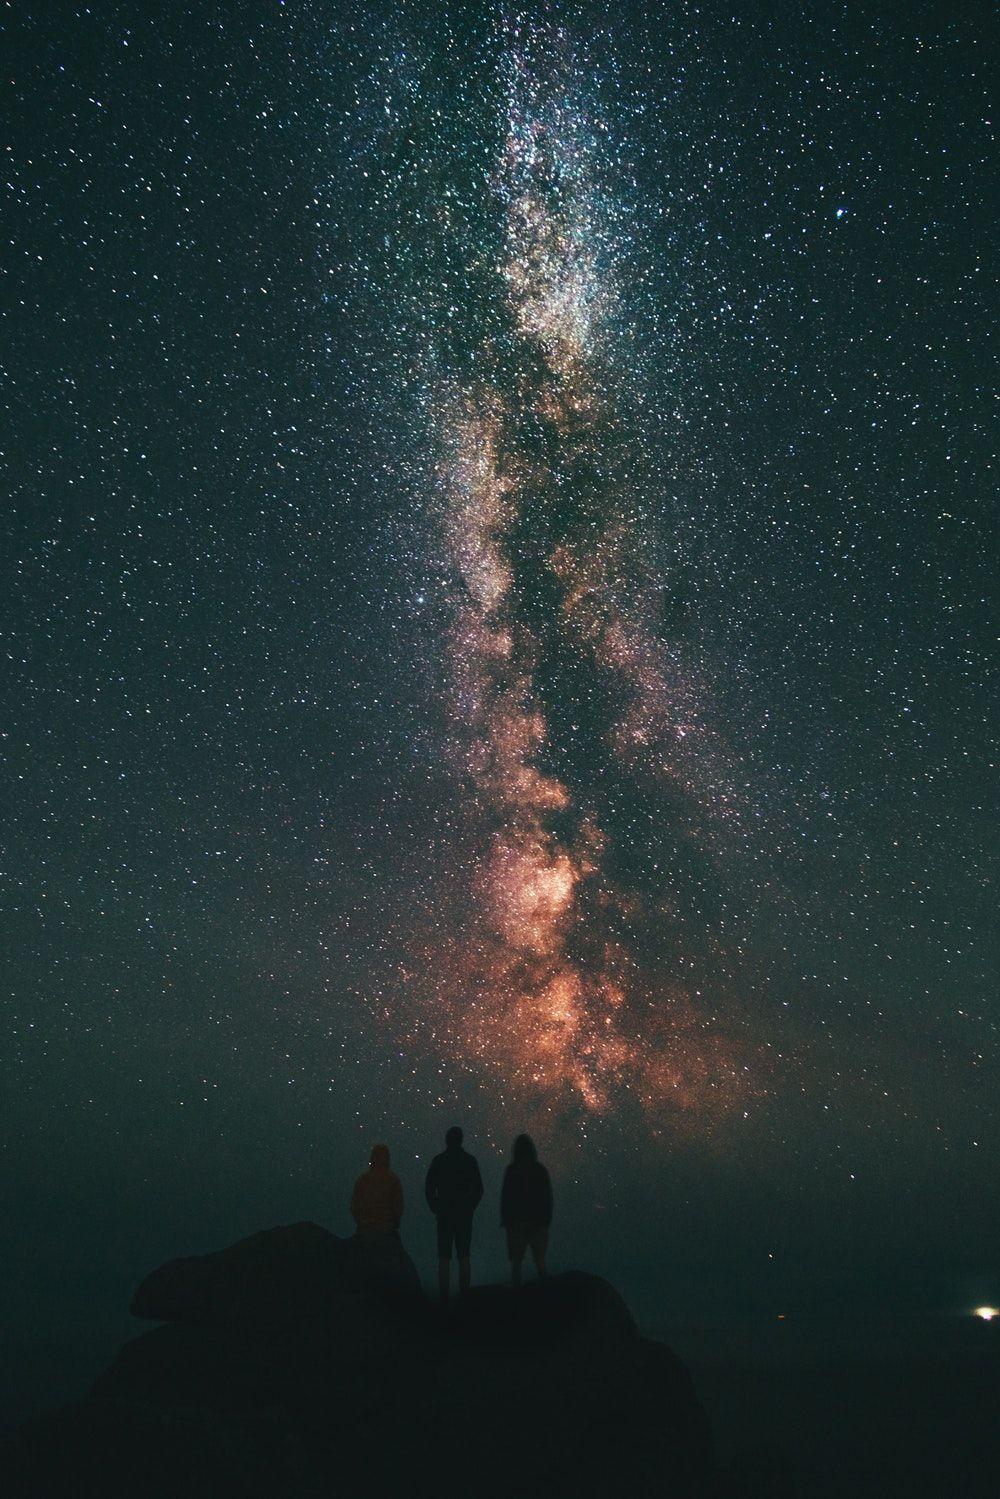 1000x1499 خلفيات جالاكسي [تنزيل مجاني!].  66 أفضل خلفية المجرة الحرة